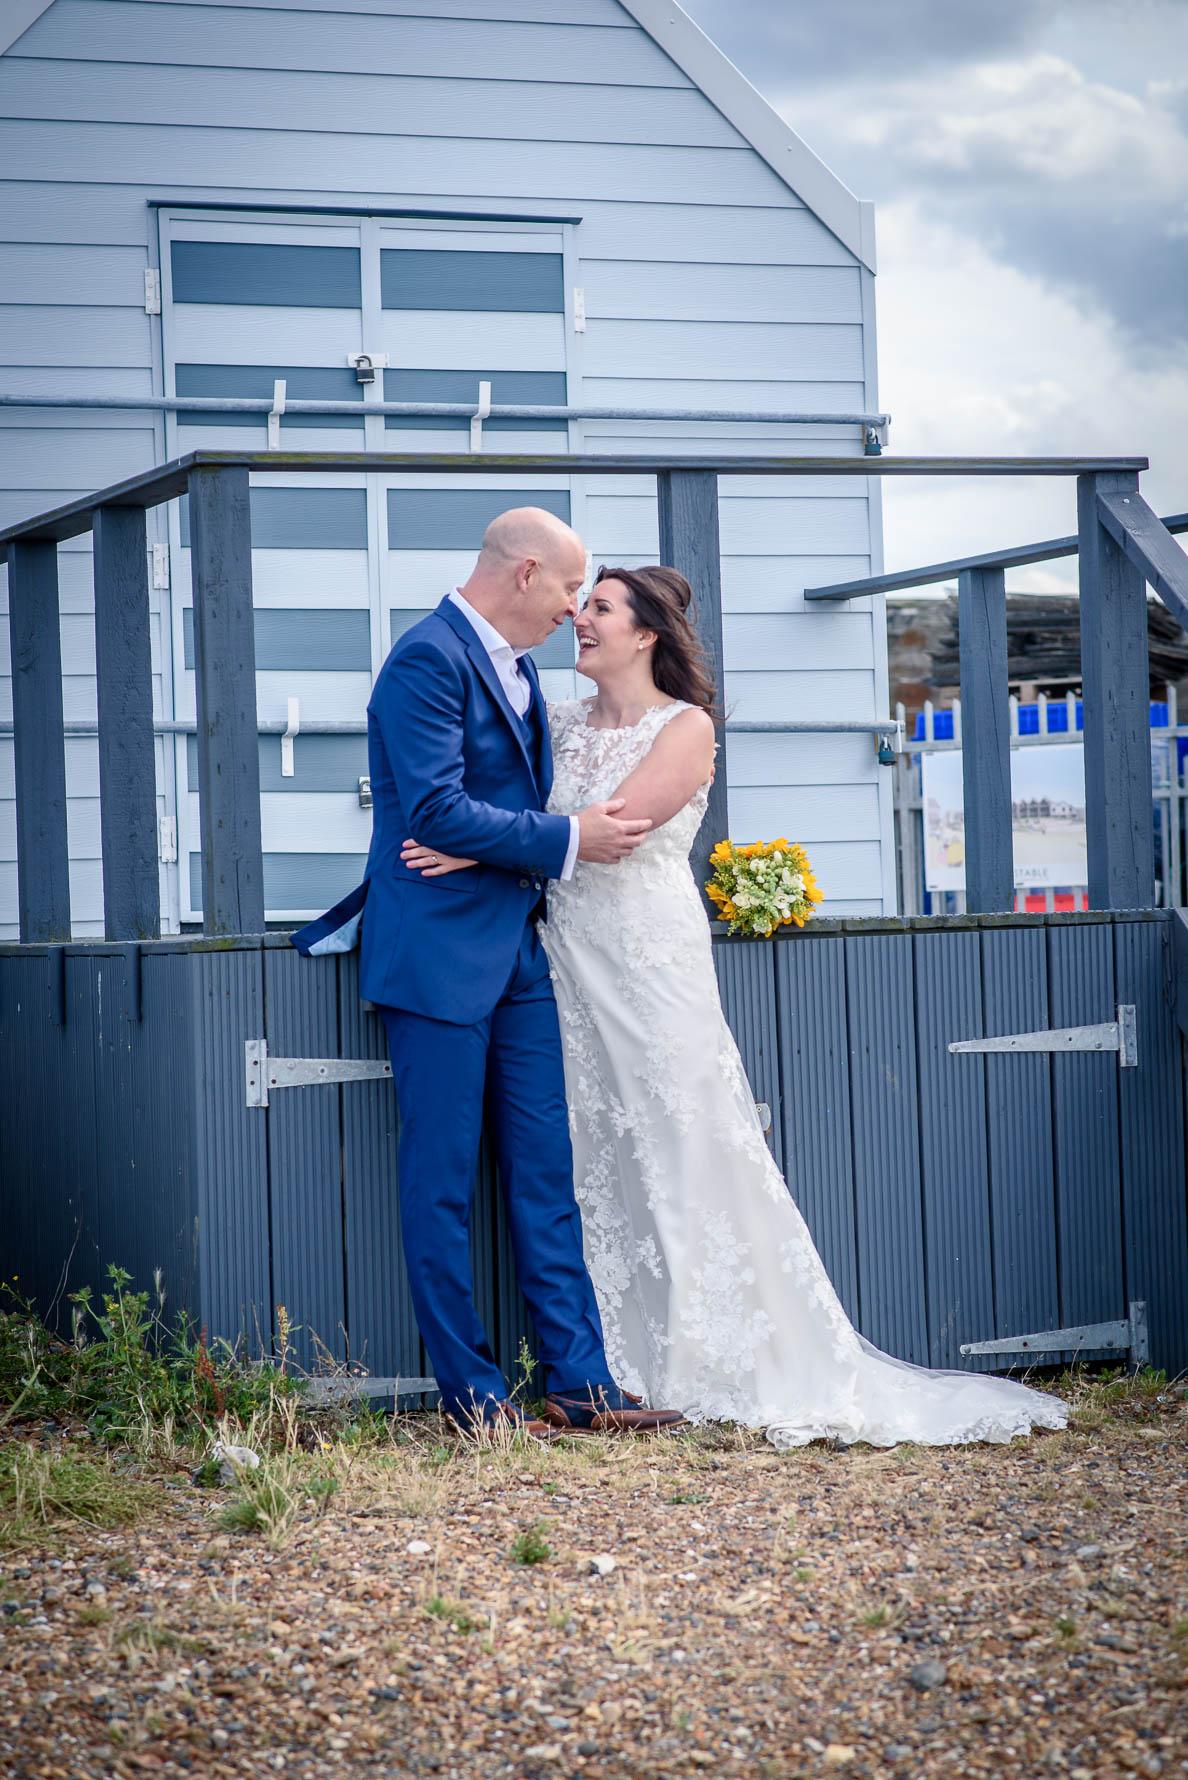 Wedding Photography at East Quay Venue-57.jpg